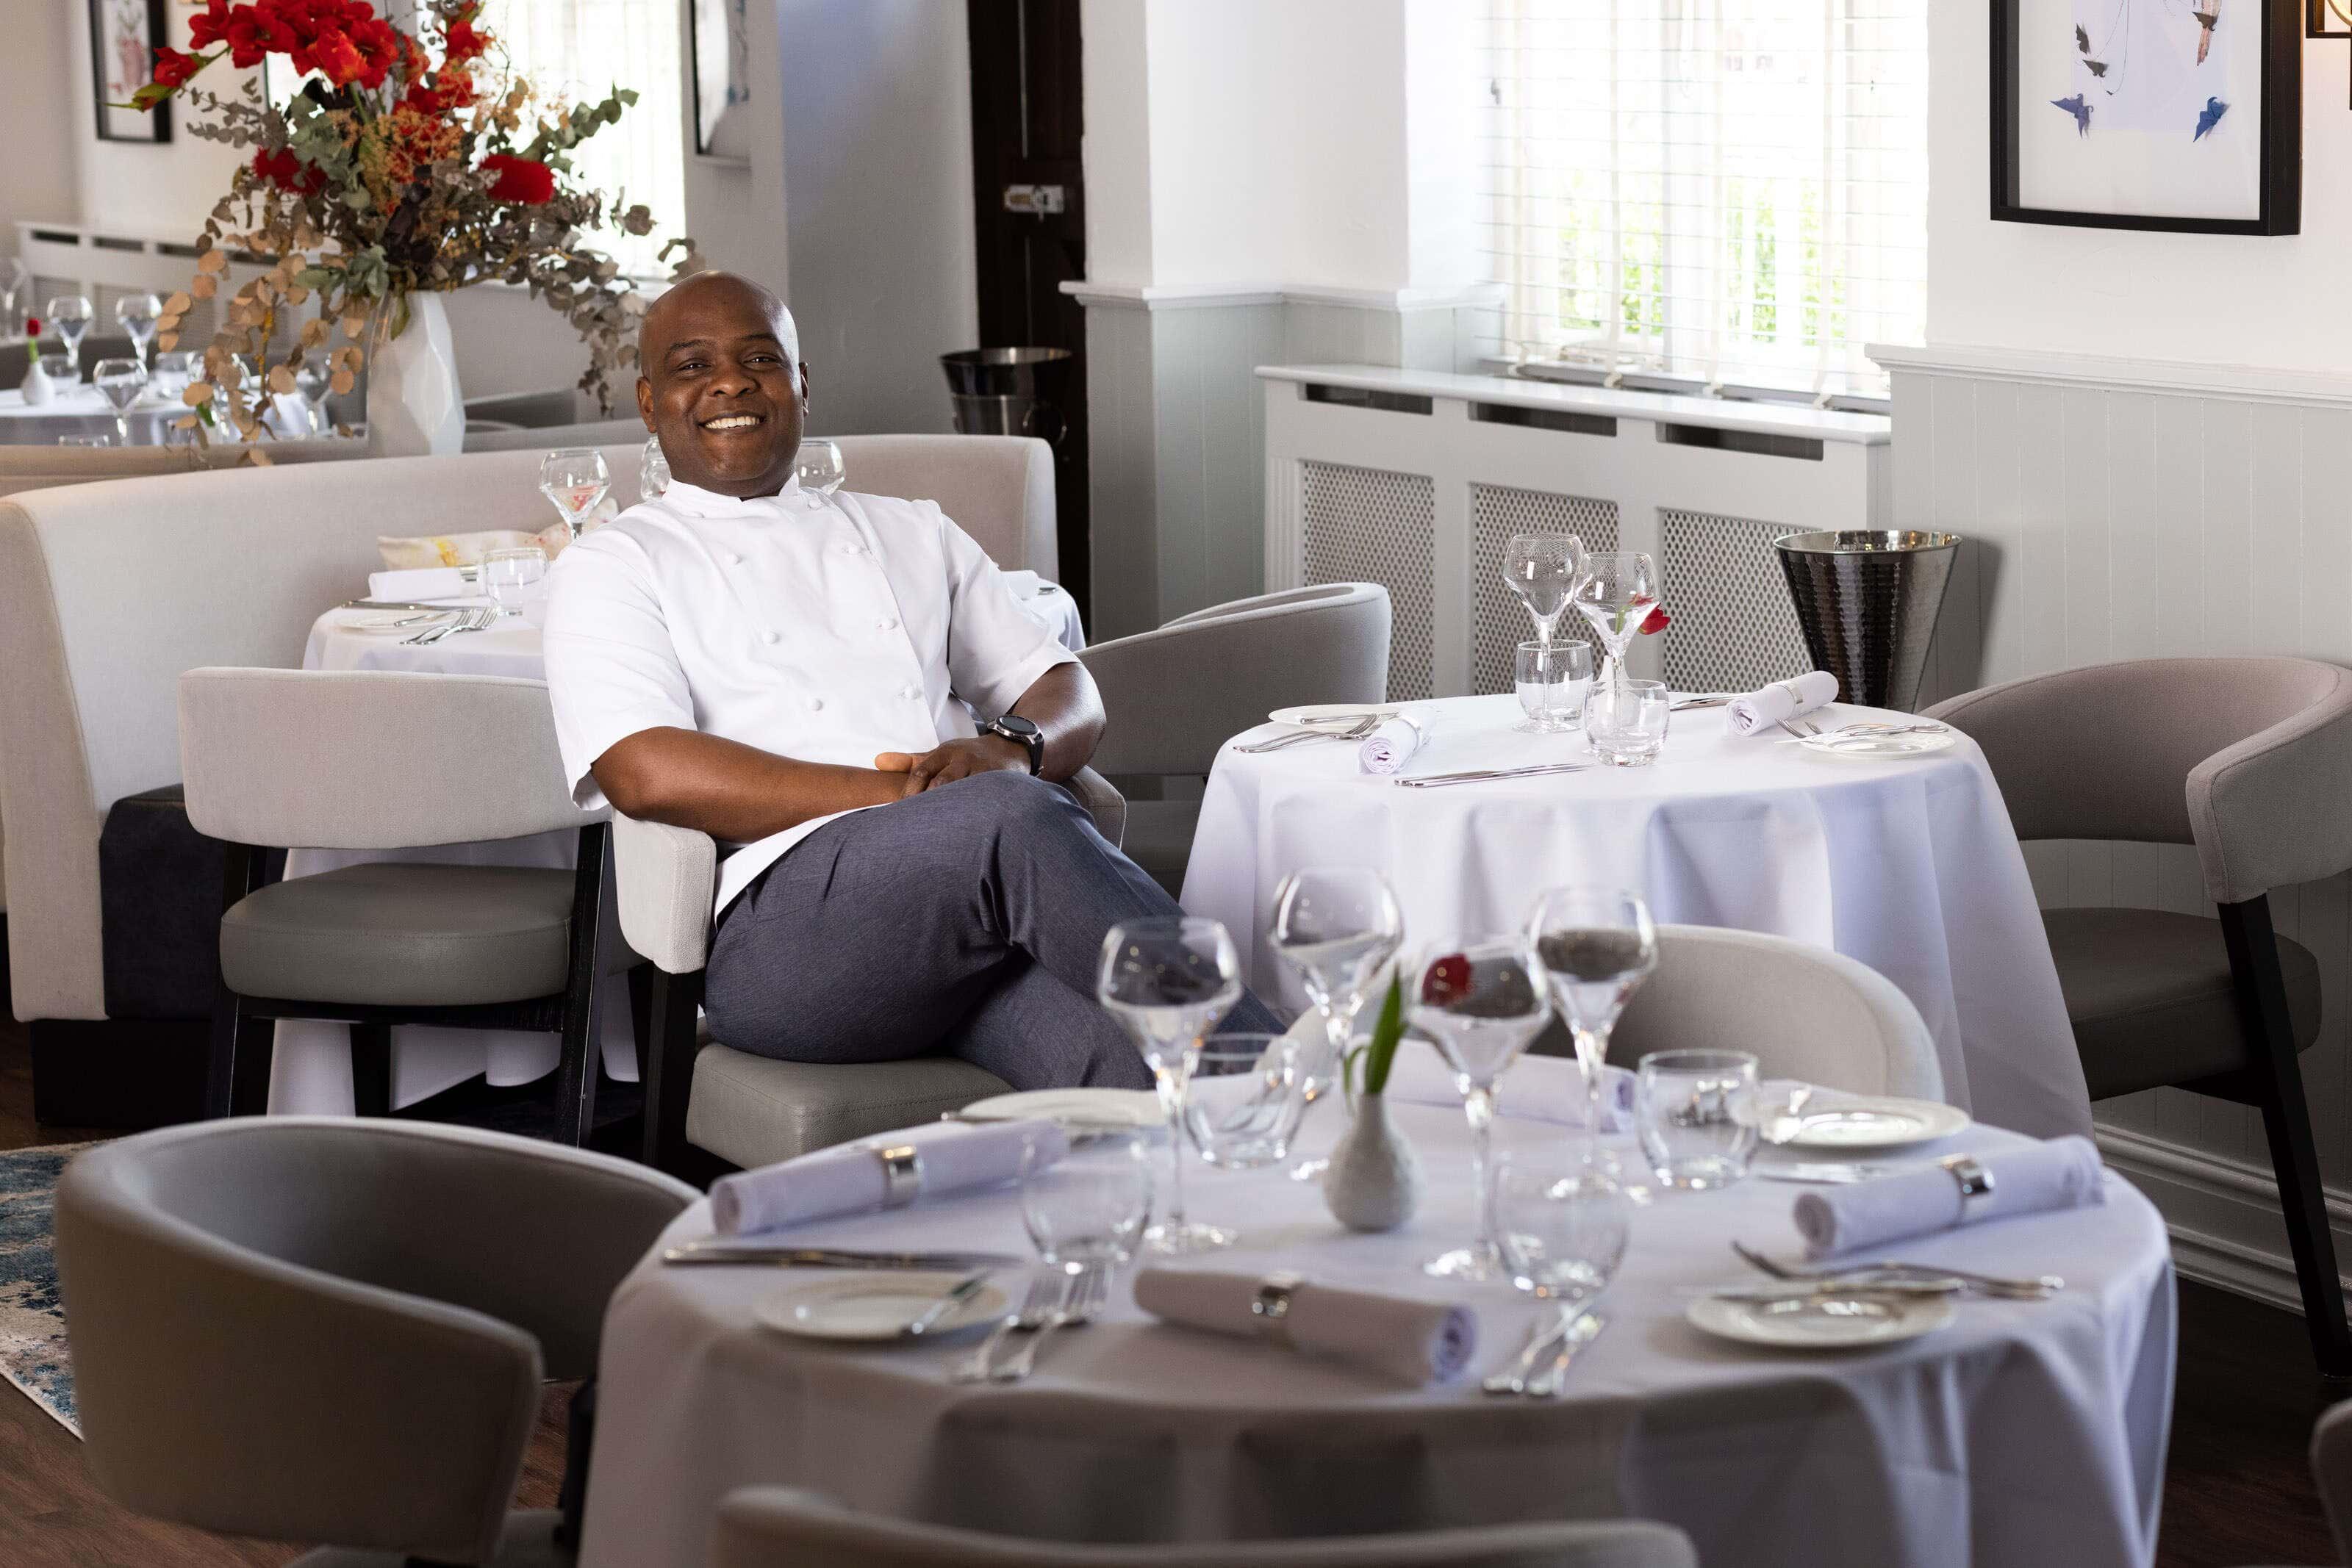 chef Adebola Adeshina sat in his restaurant the Chubby Castor